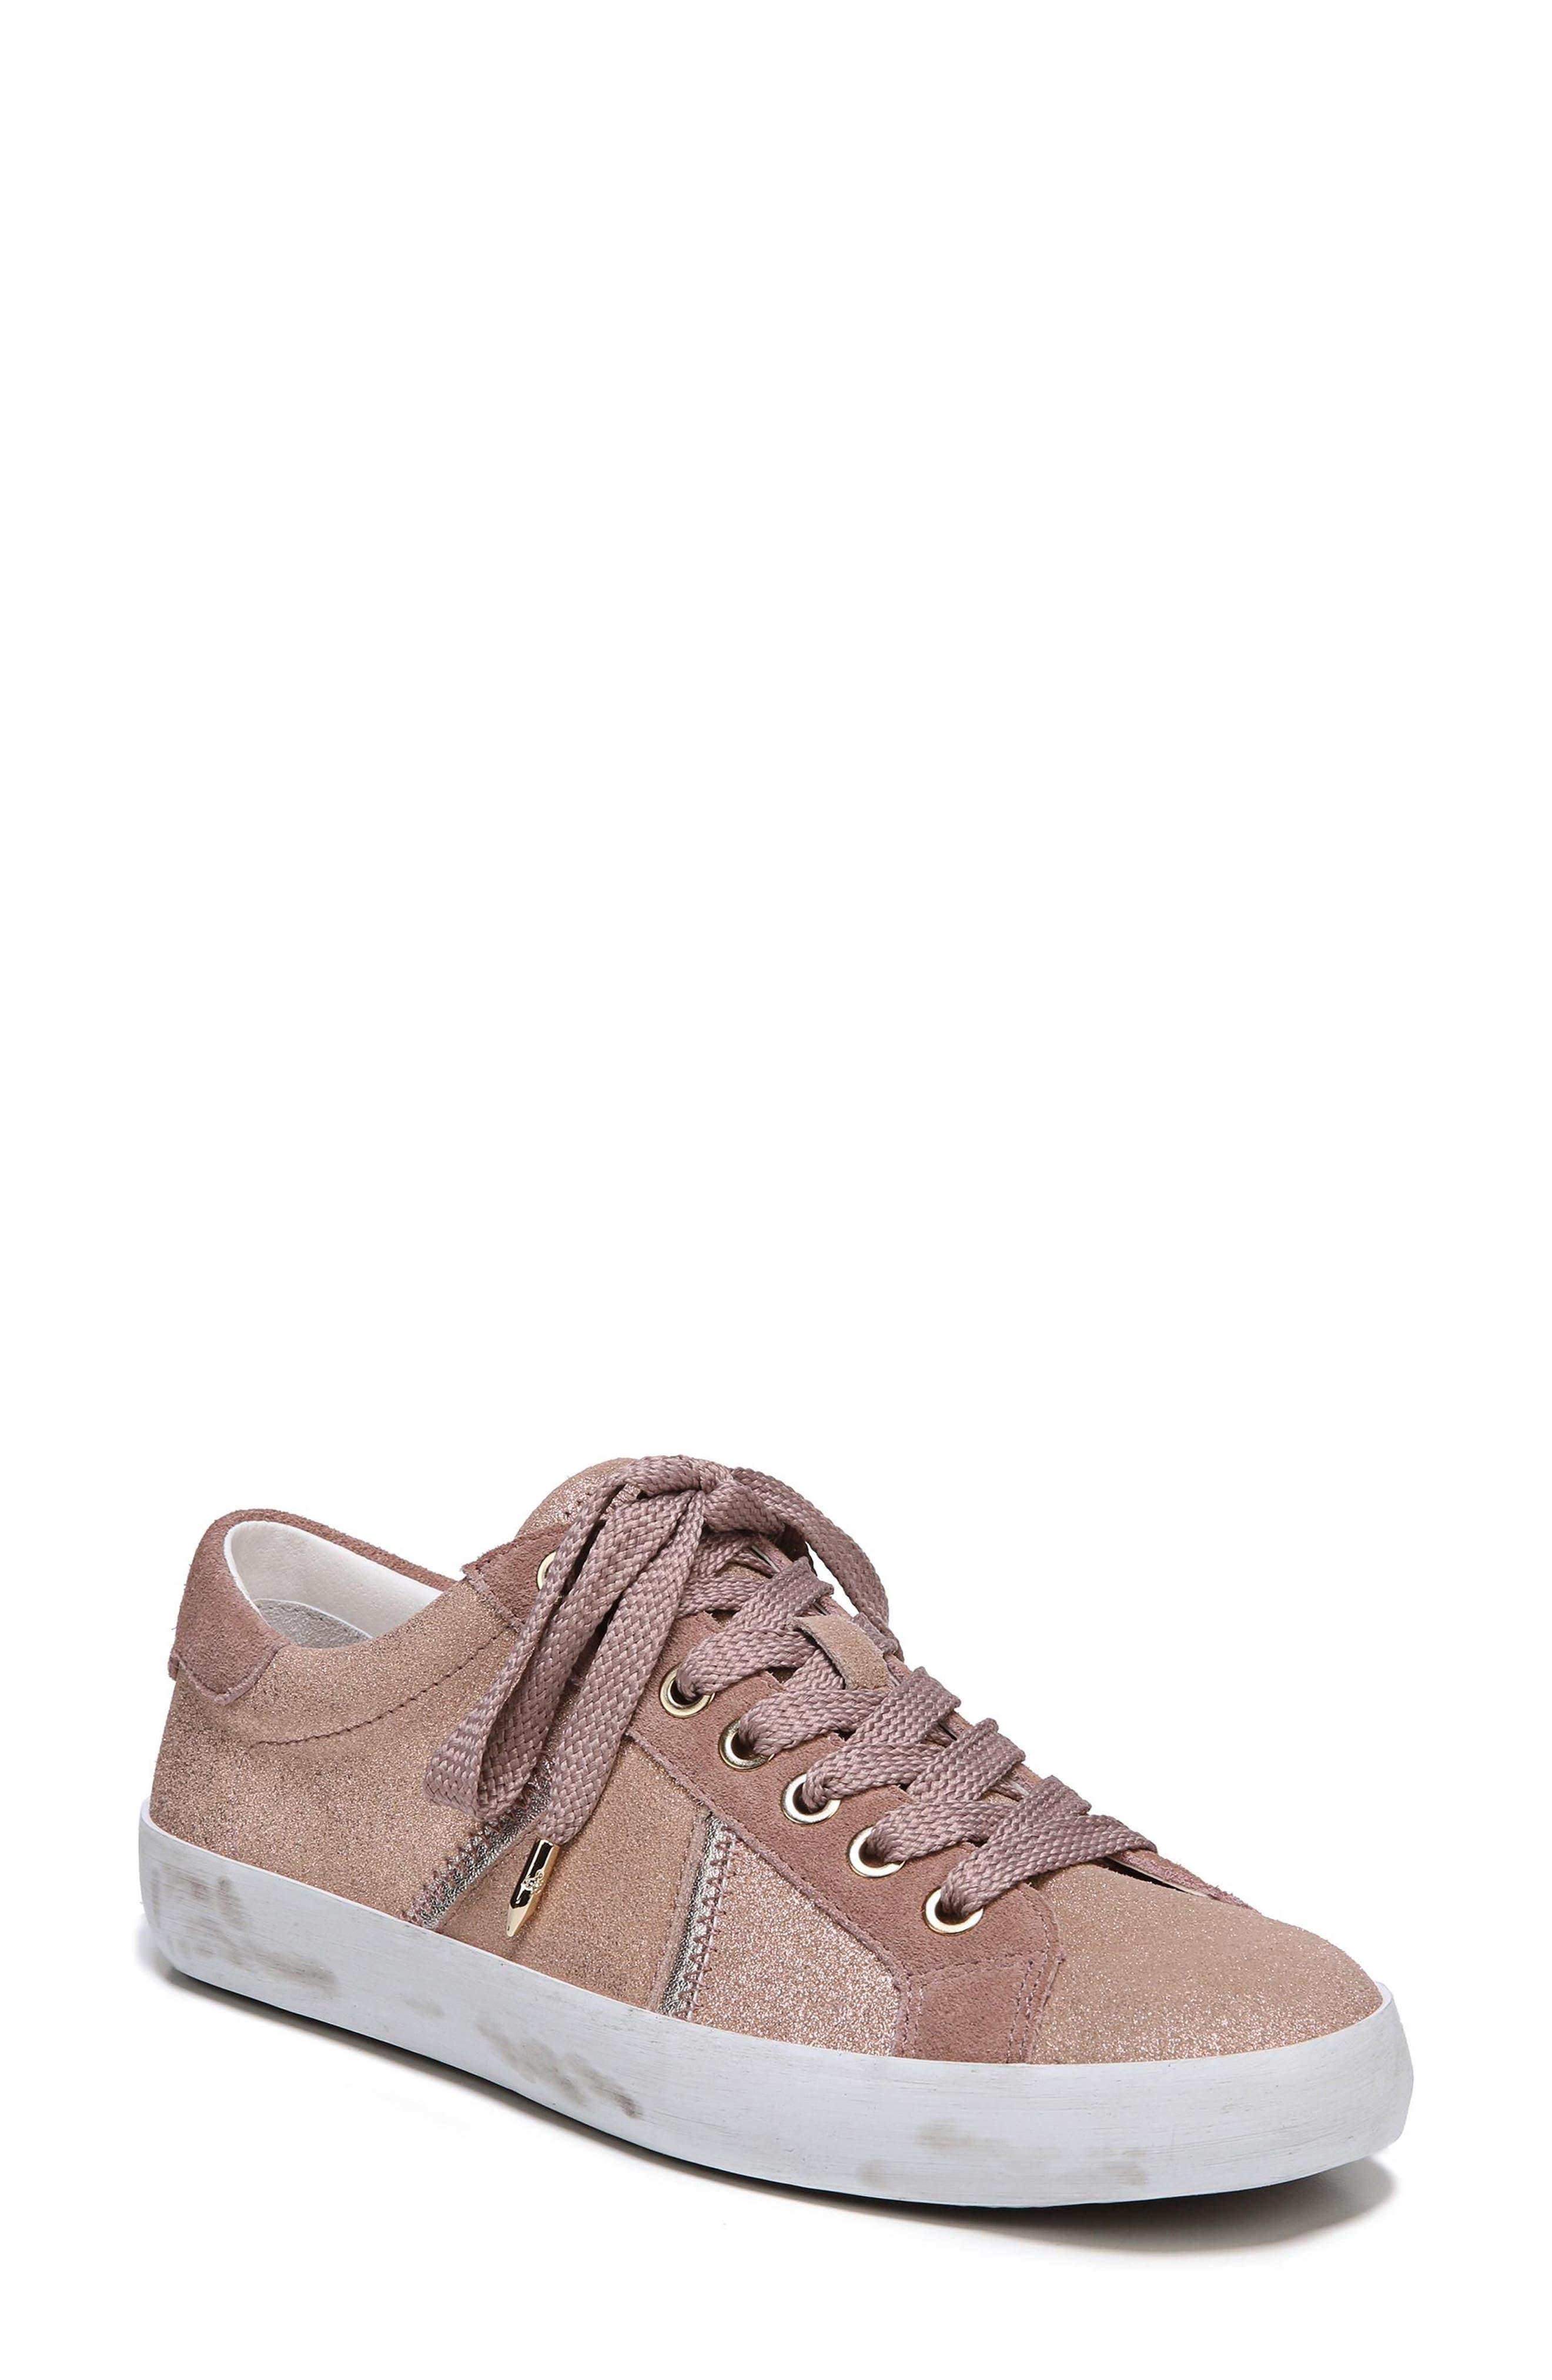 Baylee Sneaker,                         Main,                         color,